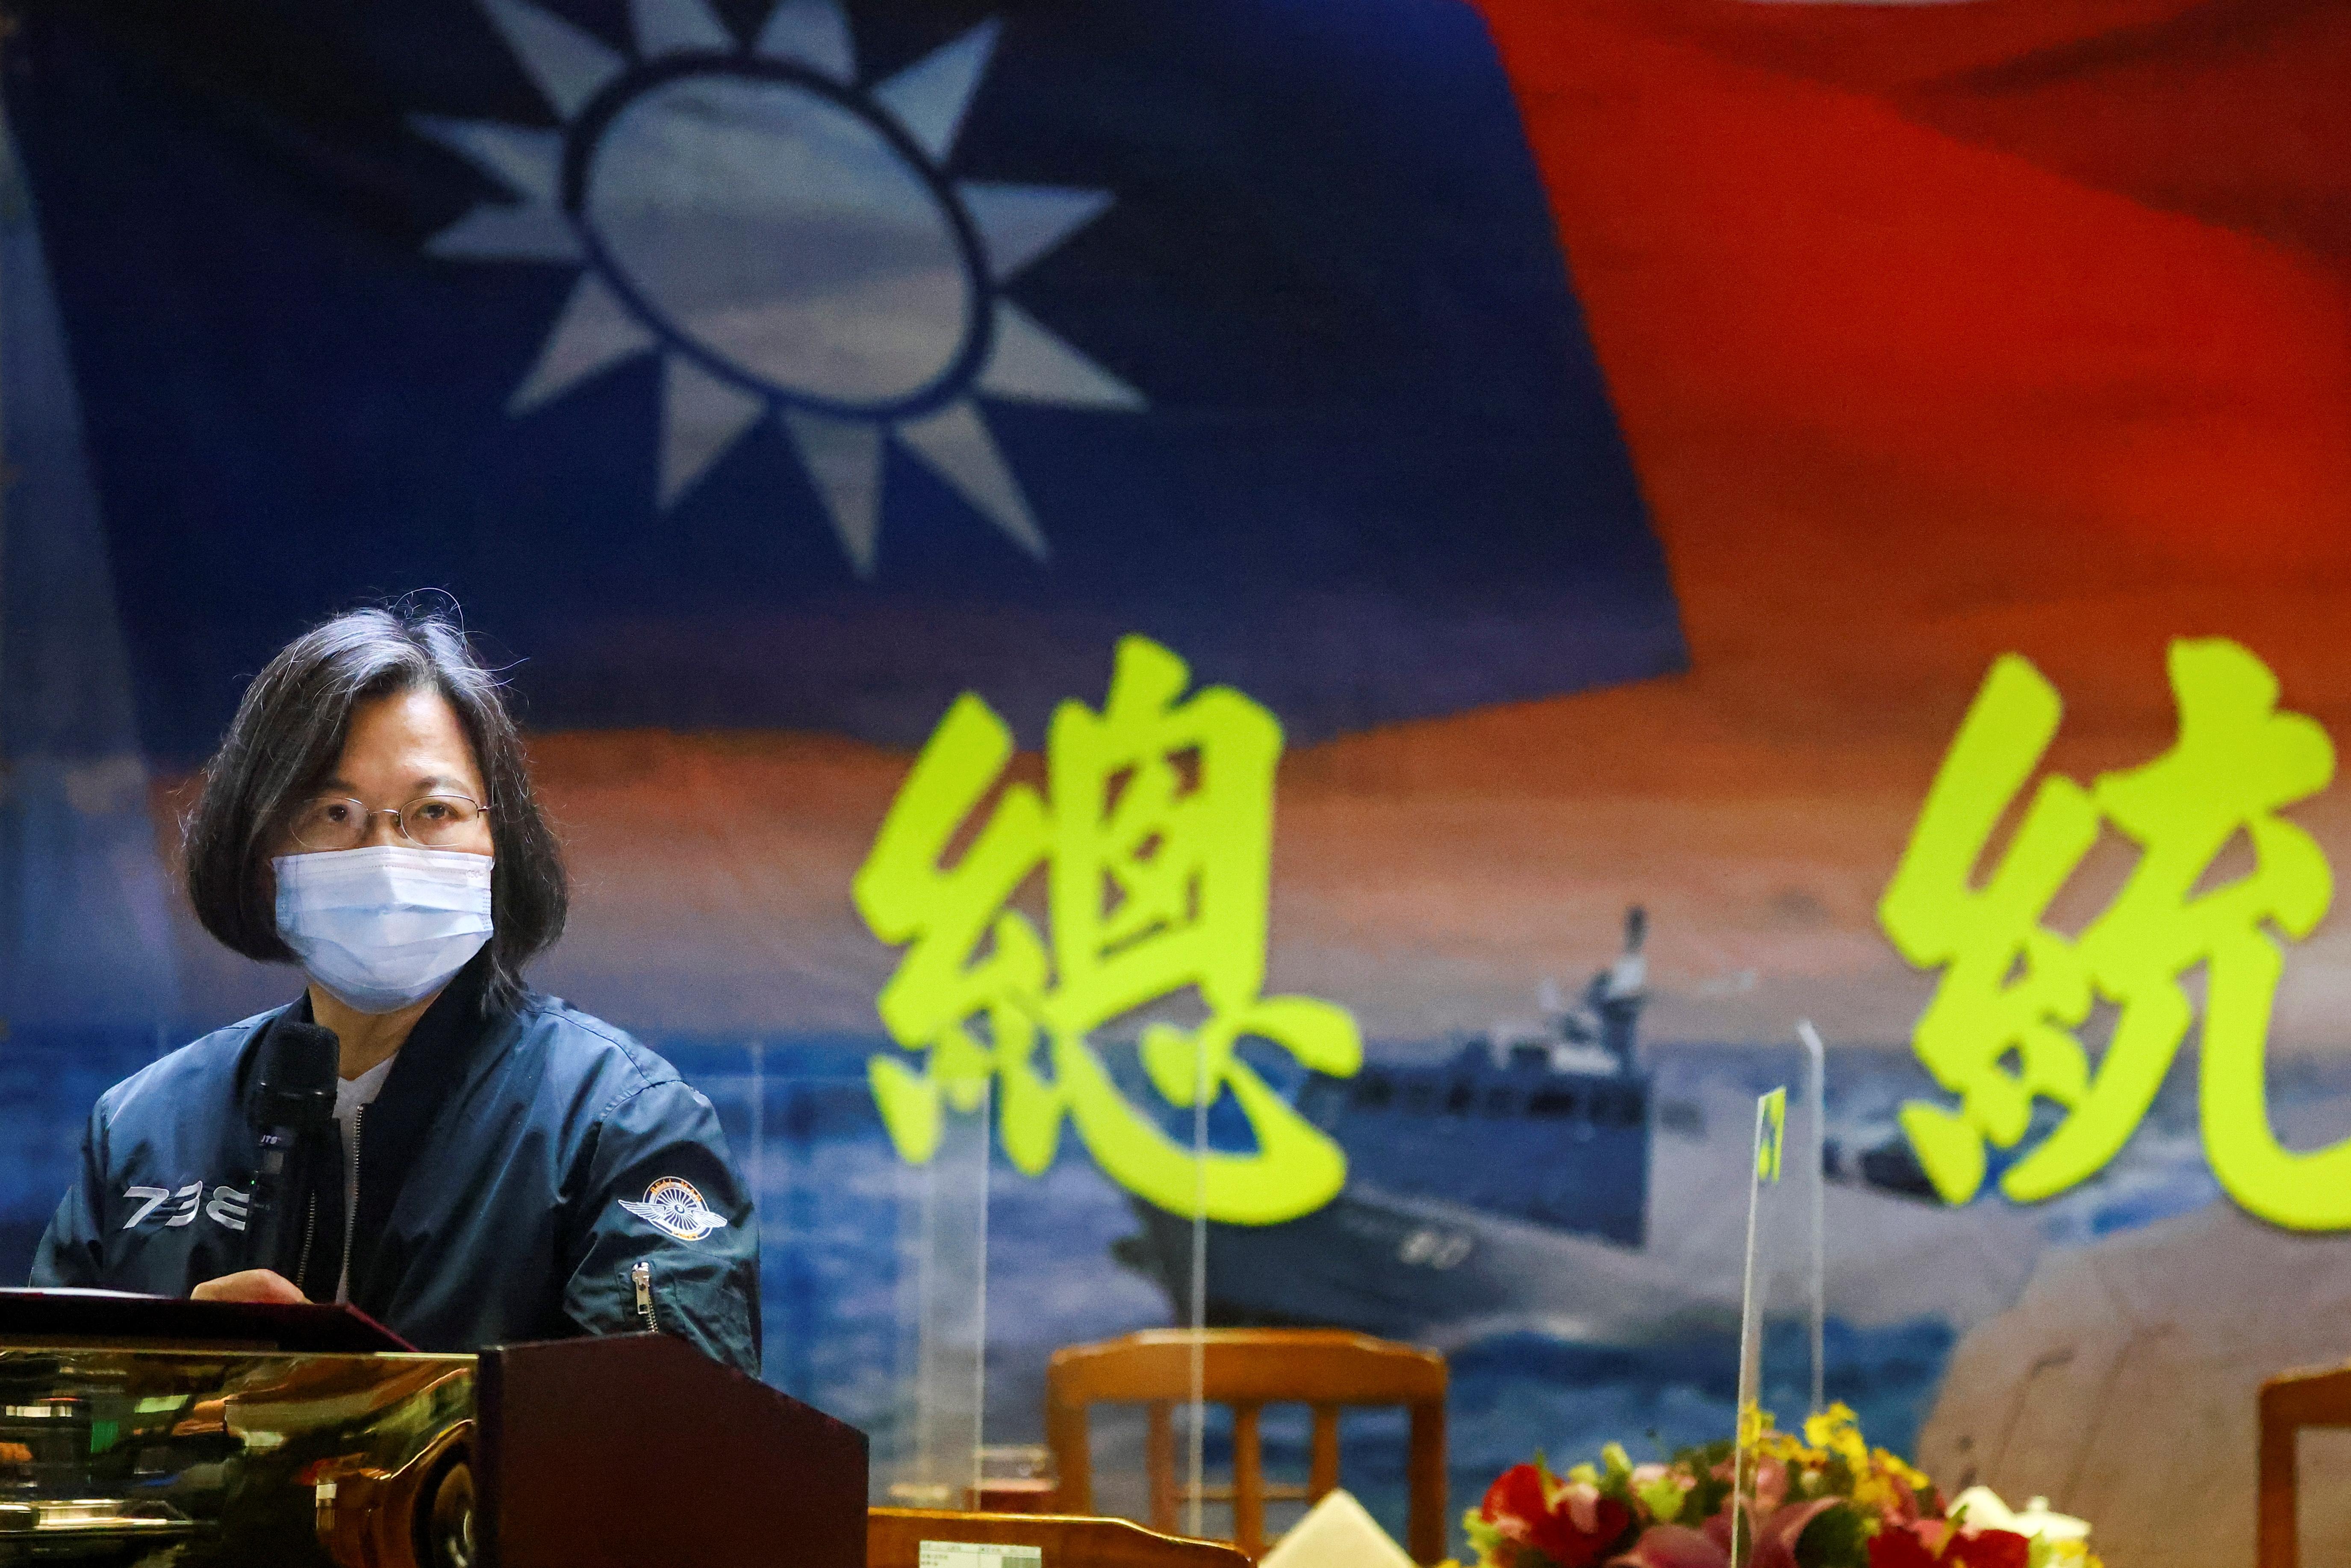 Taiwan's President Tsai Ing-wen gives a speech after visiting the Navy's 131st Fleet in Keelung, Taiwan, March 8, 2021. REUTERS/Ann Wang